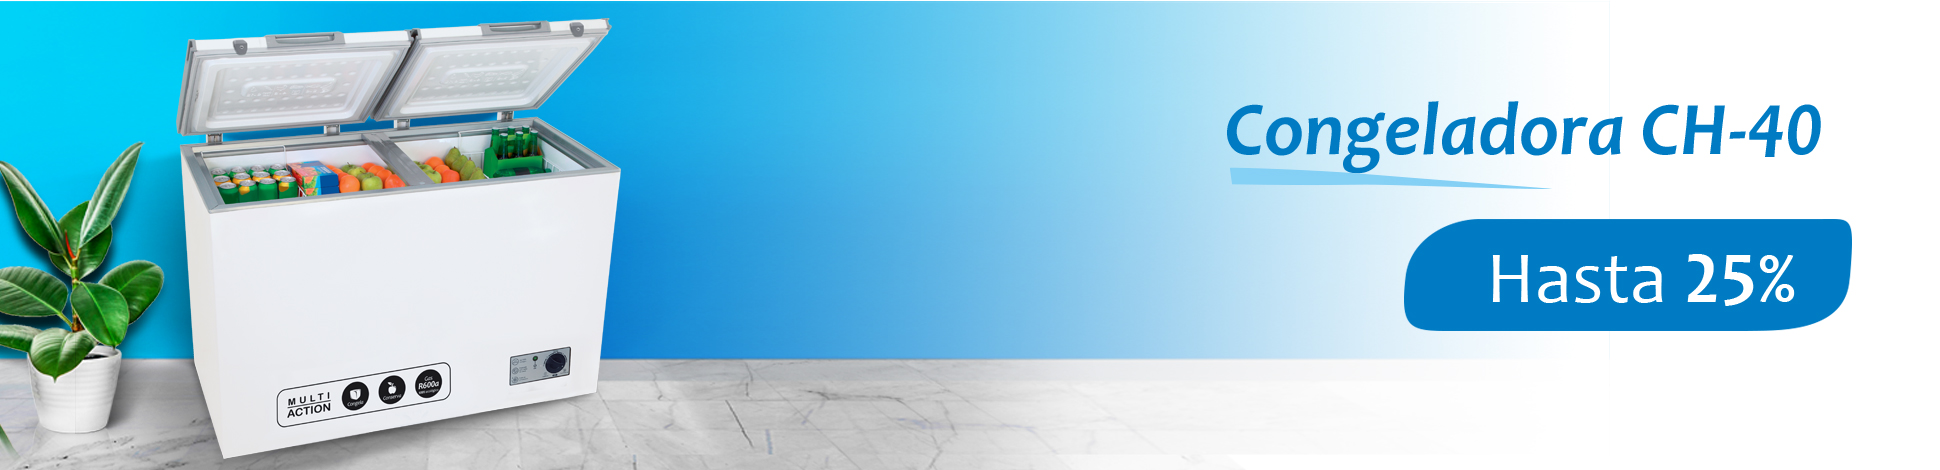 BANNER-CH40.jpg | Juntoz.com